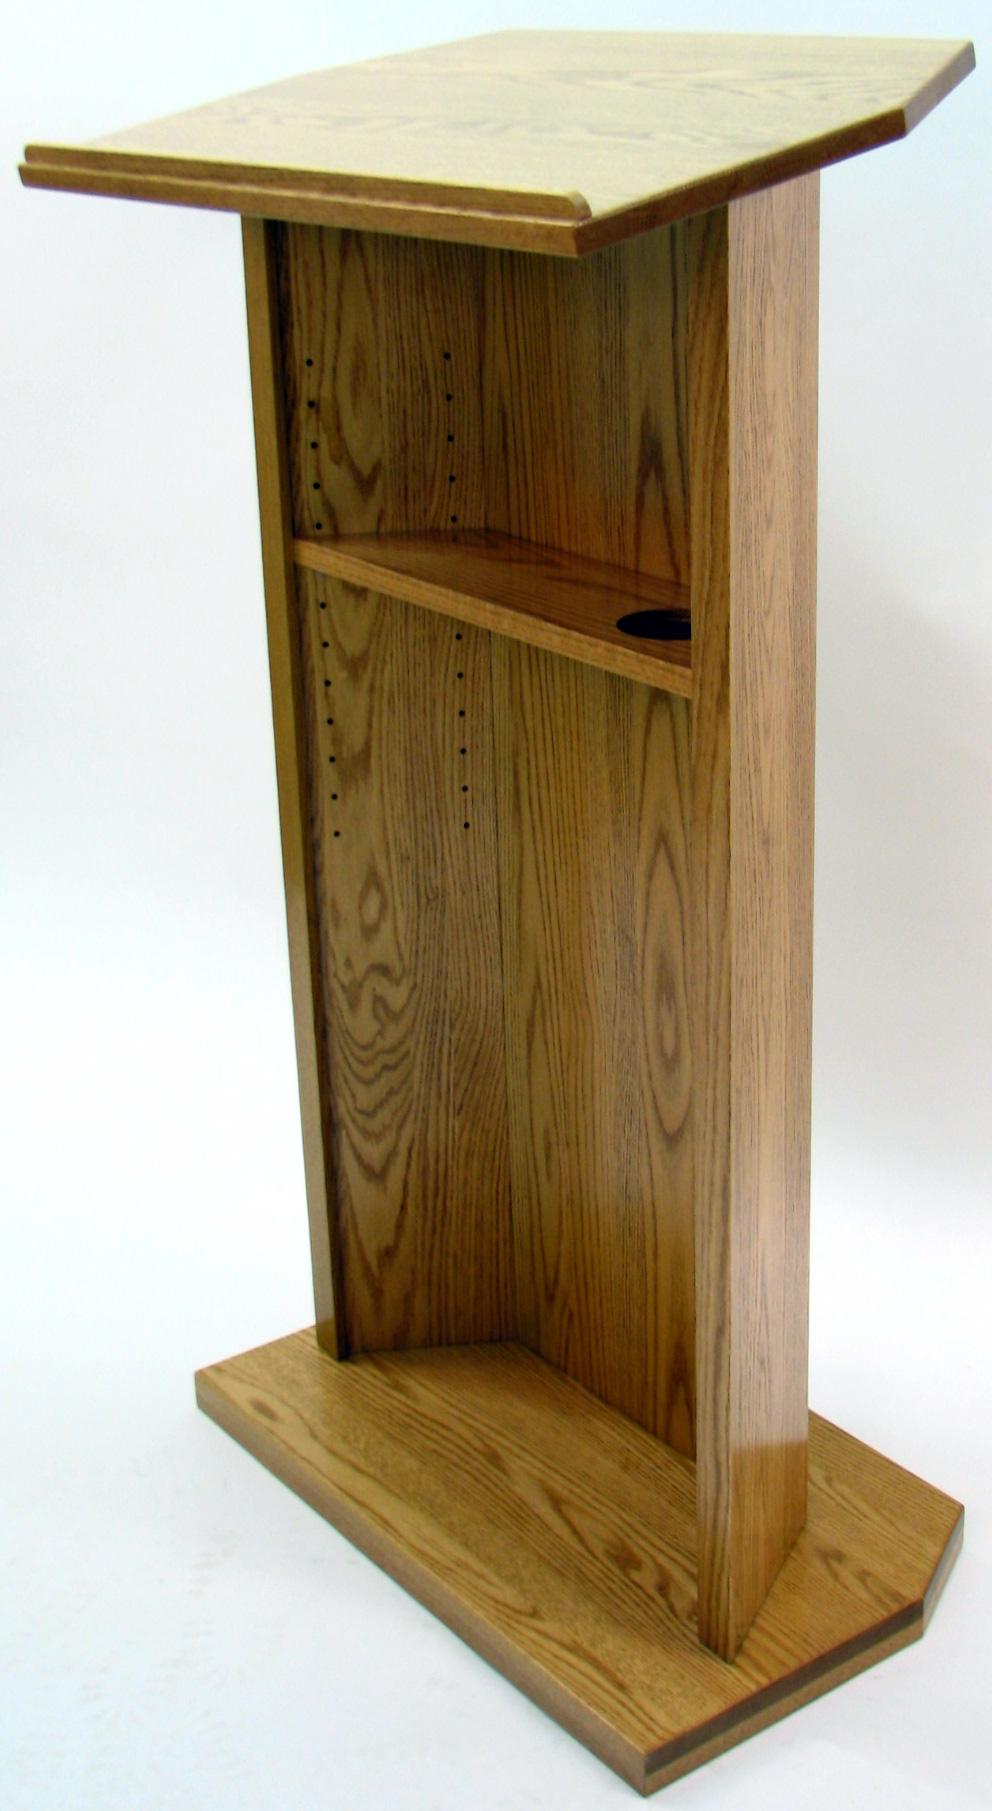 Executive wood diplomat oak lectern light finish